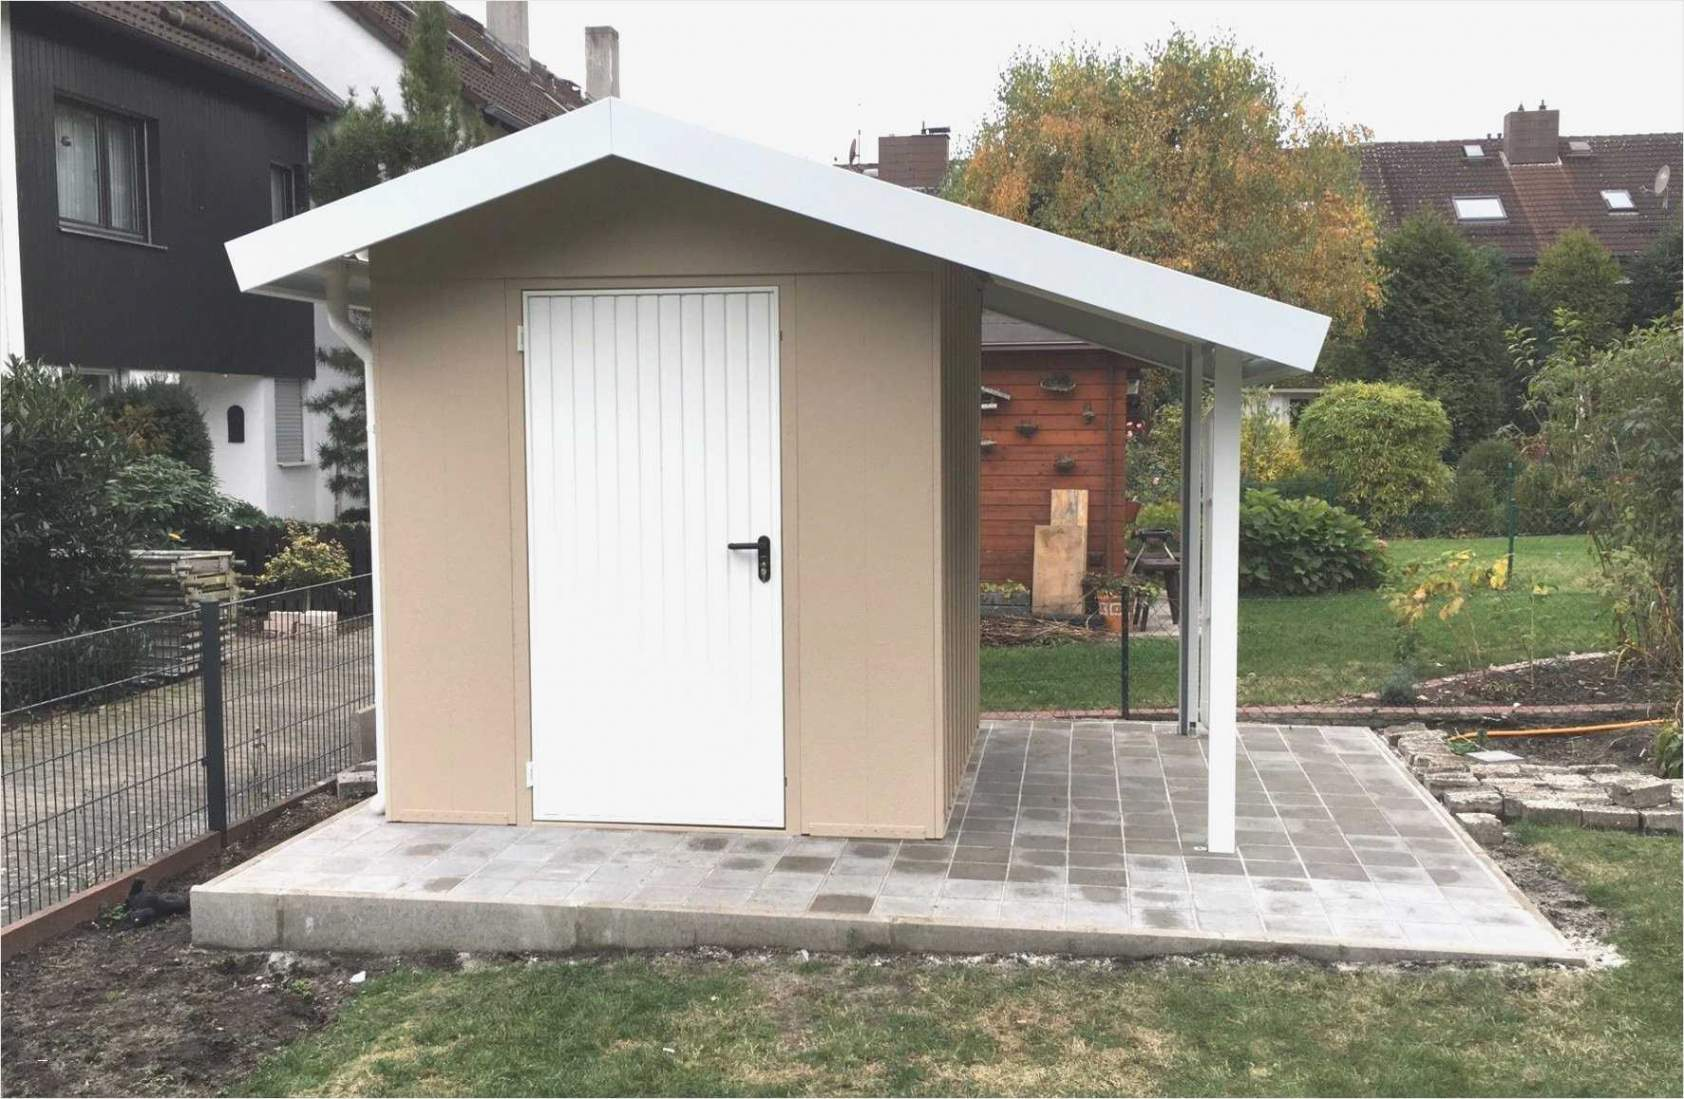 63 grose markise terrasse wetterschutzrollo selber bauen wetterschutzrollo selber bauen